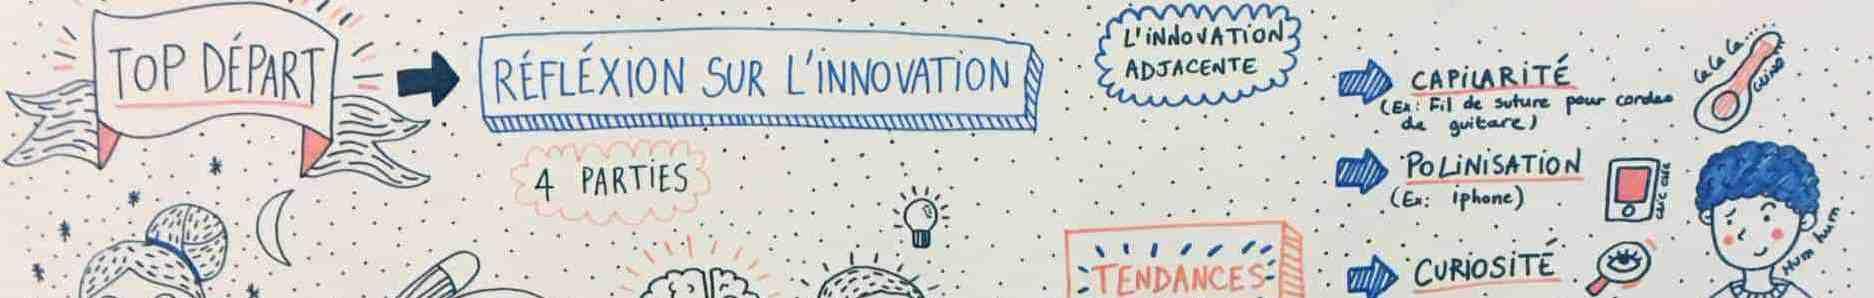 classement innovation